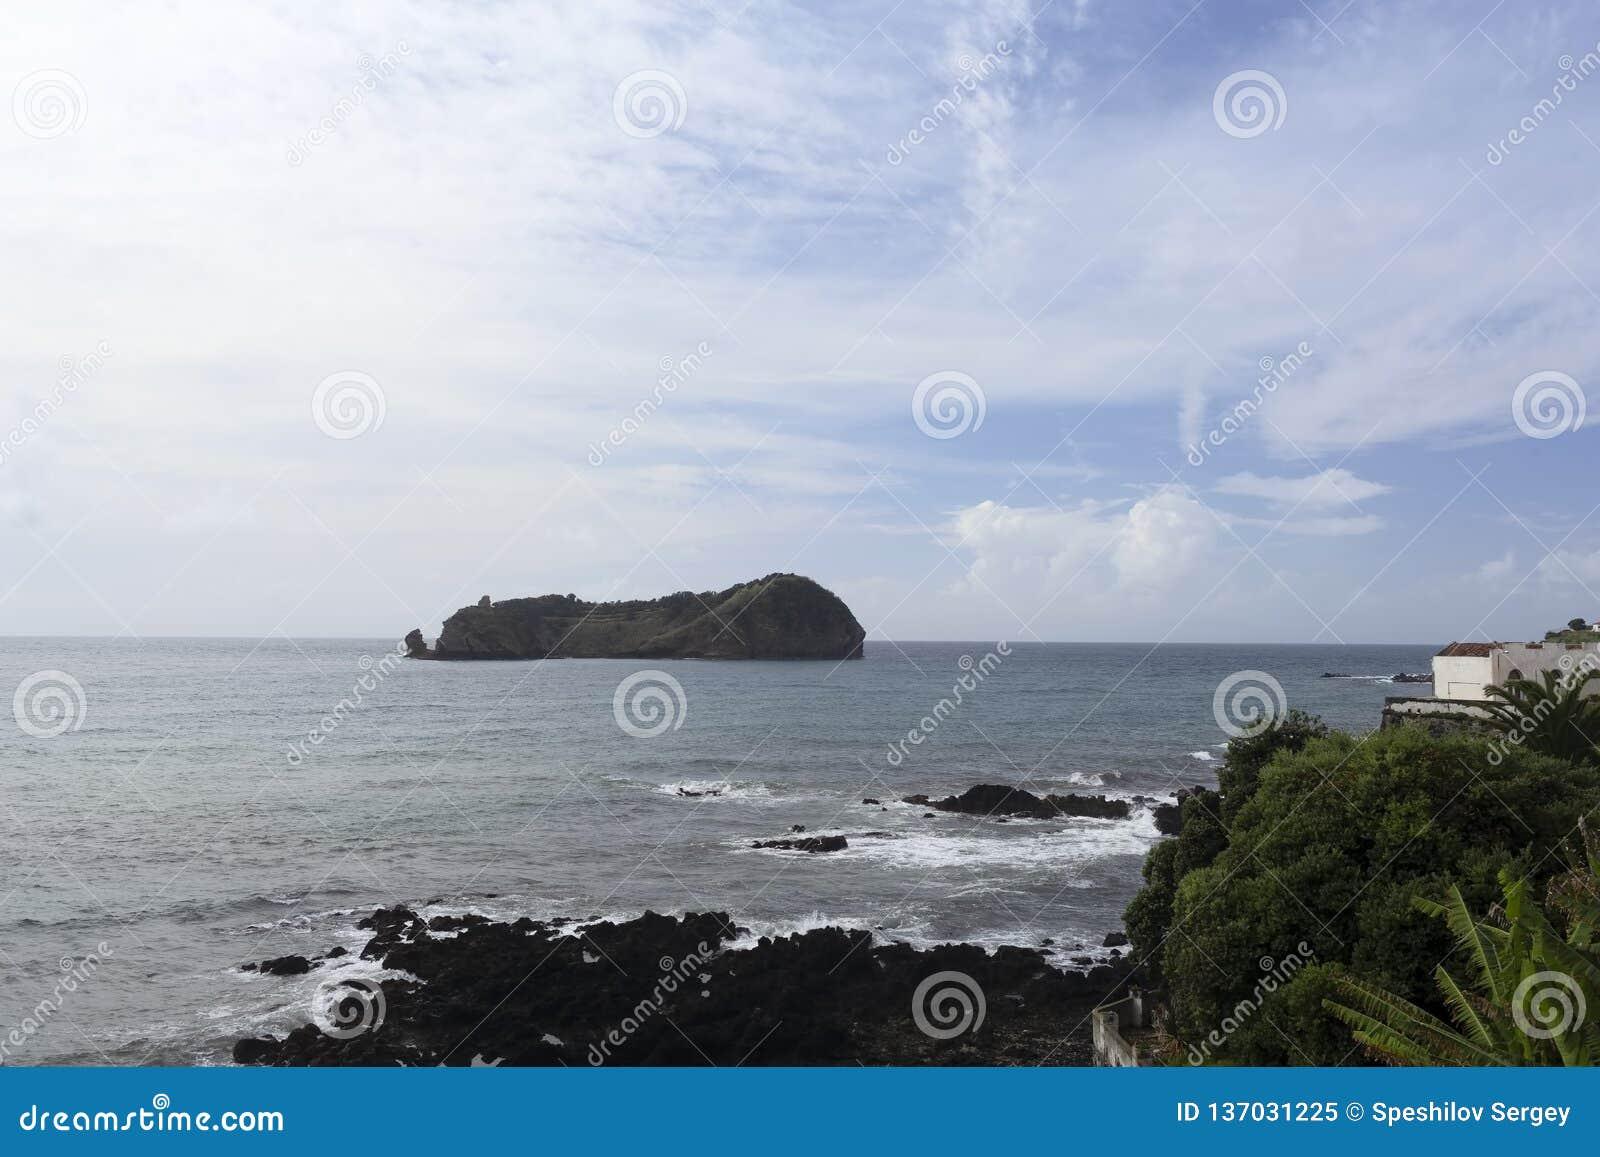 View of the island of Ilheu da Vila